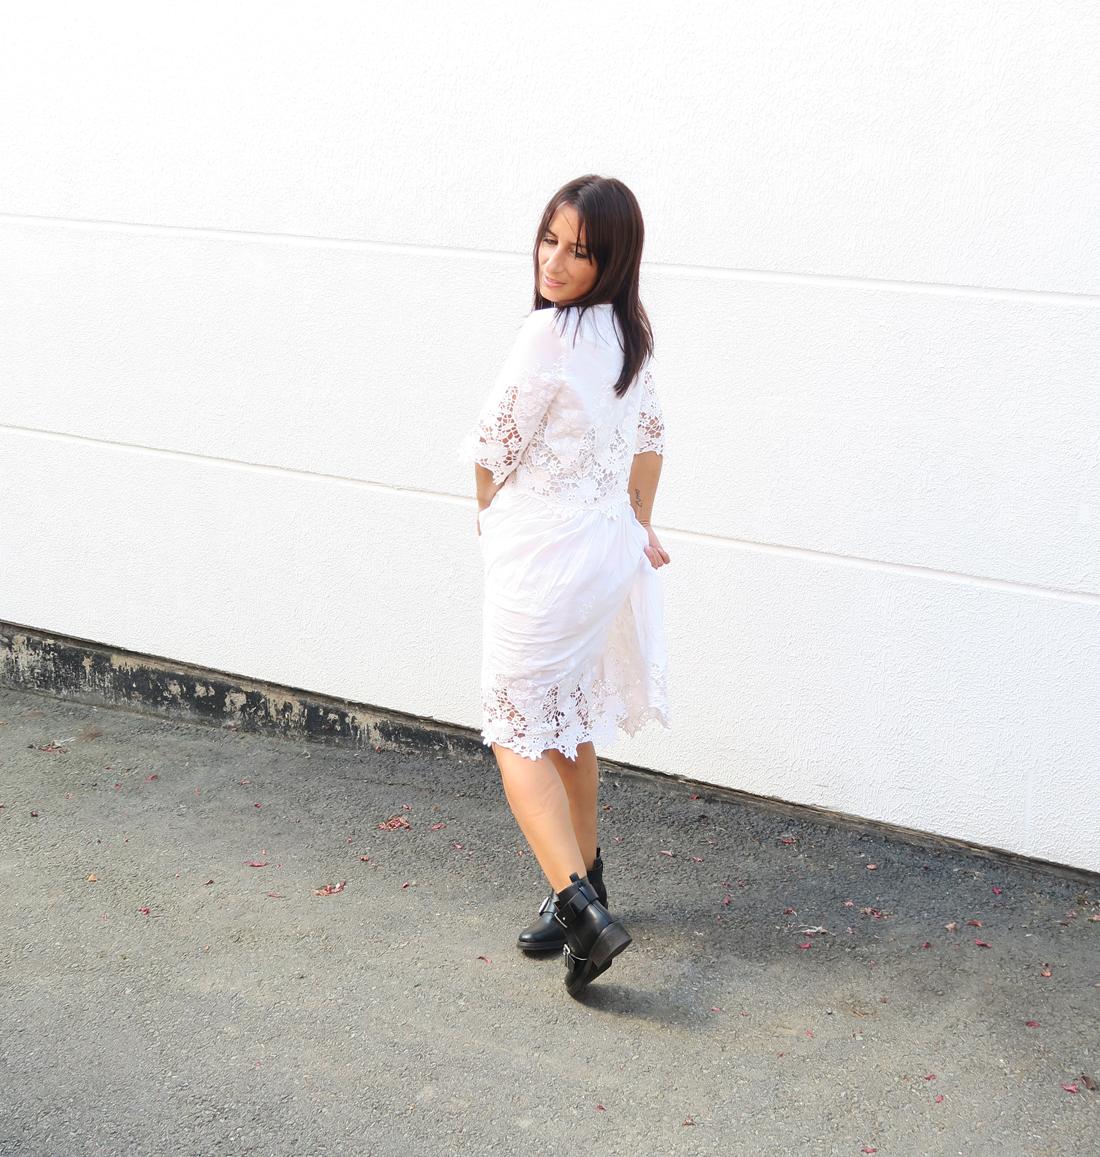 blogger-edited-style-look-bloggerstyle-spitzenkleid-dress-kleid-boots-bikerboots-1